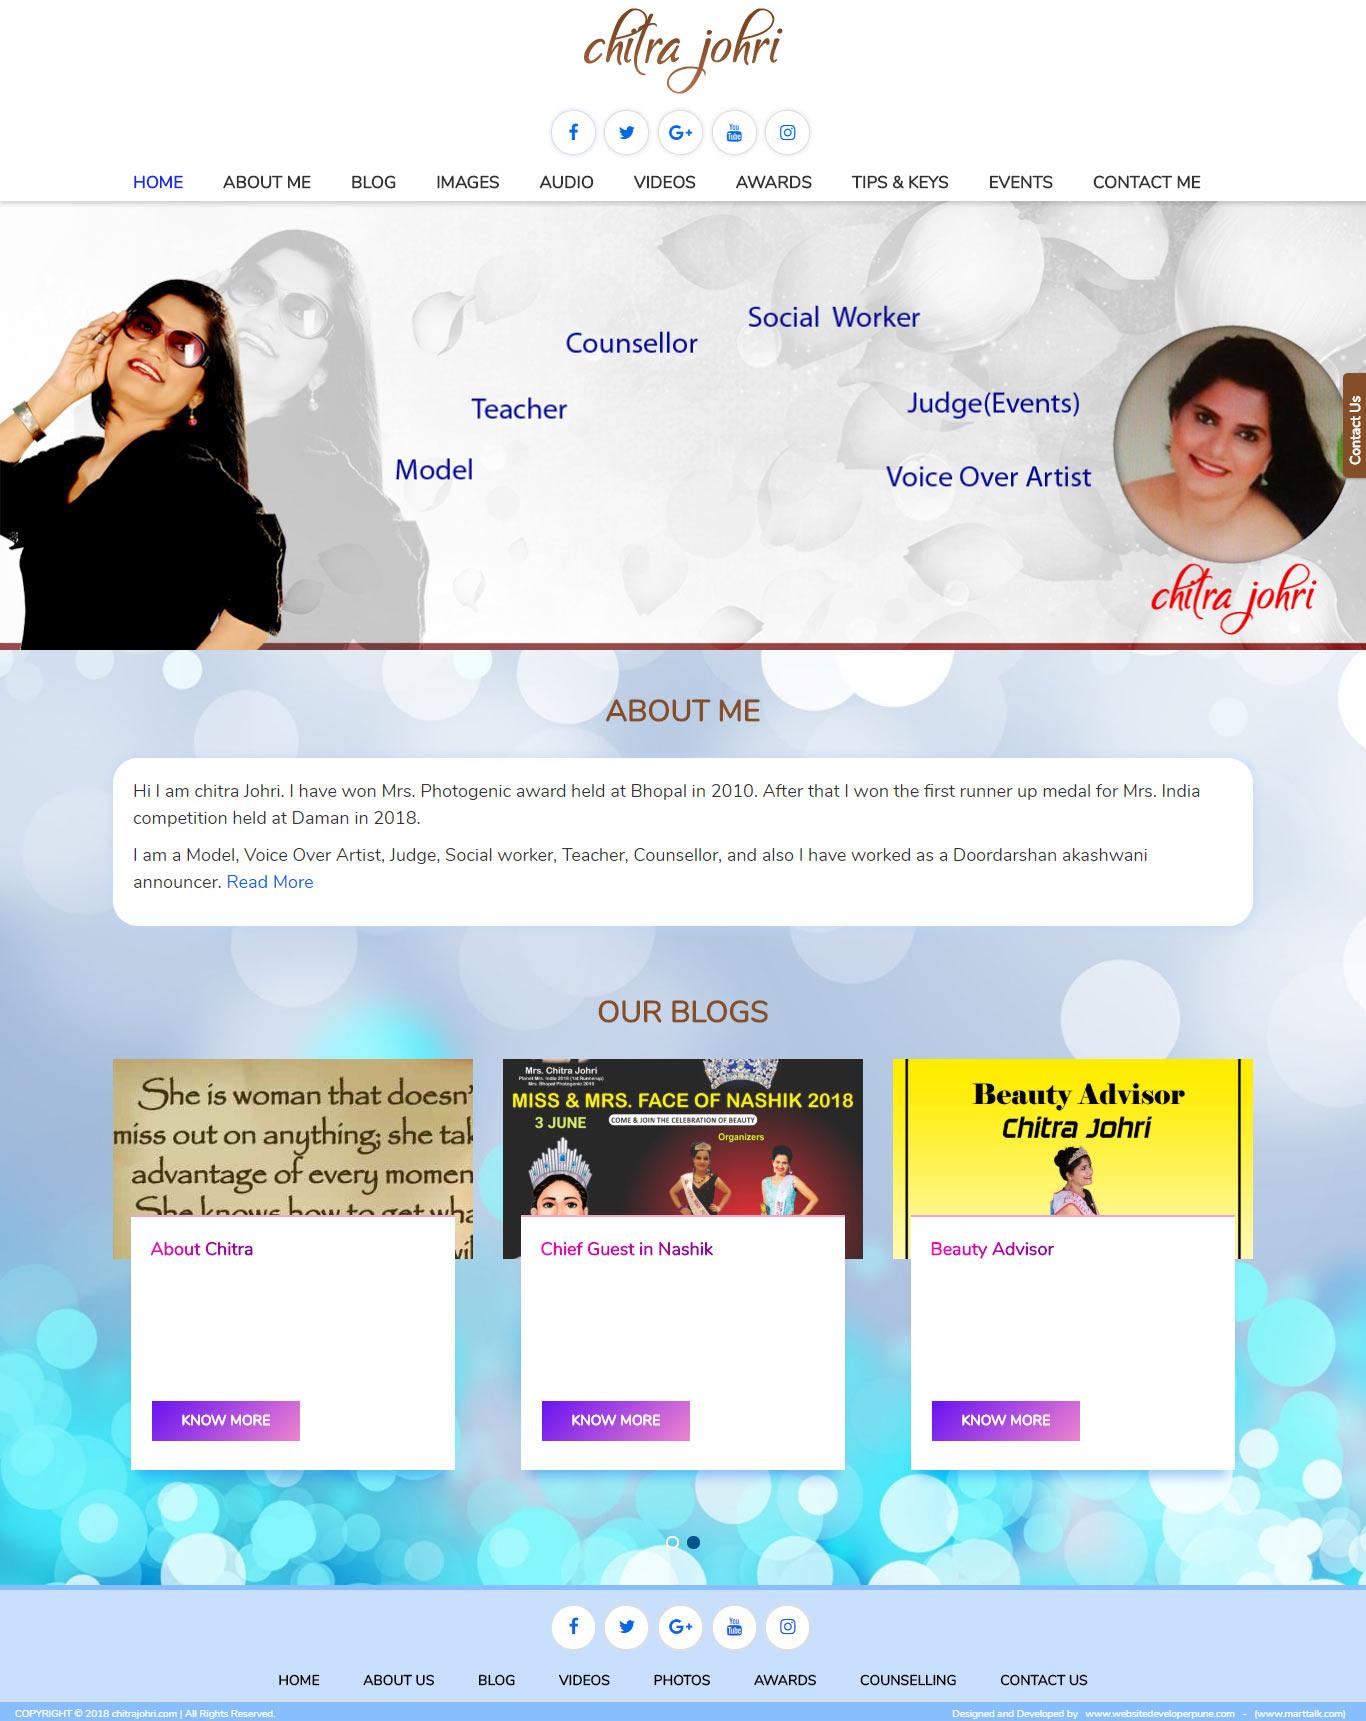 chitrajohri-com-vicky-webdeveloper-portfolio